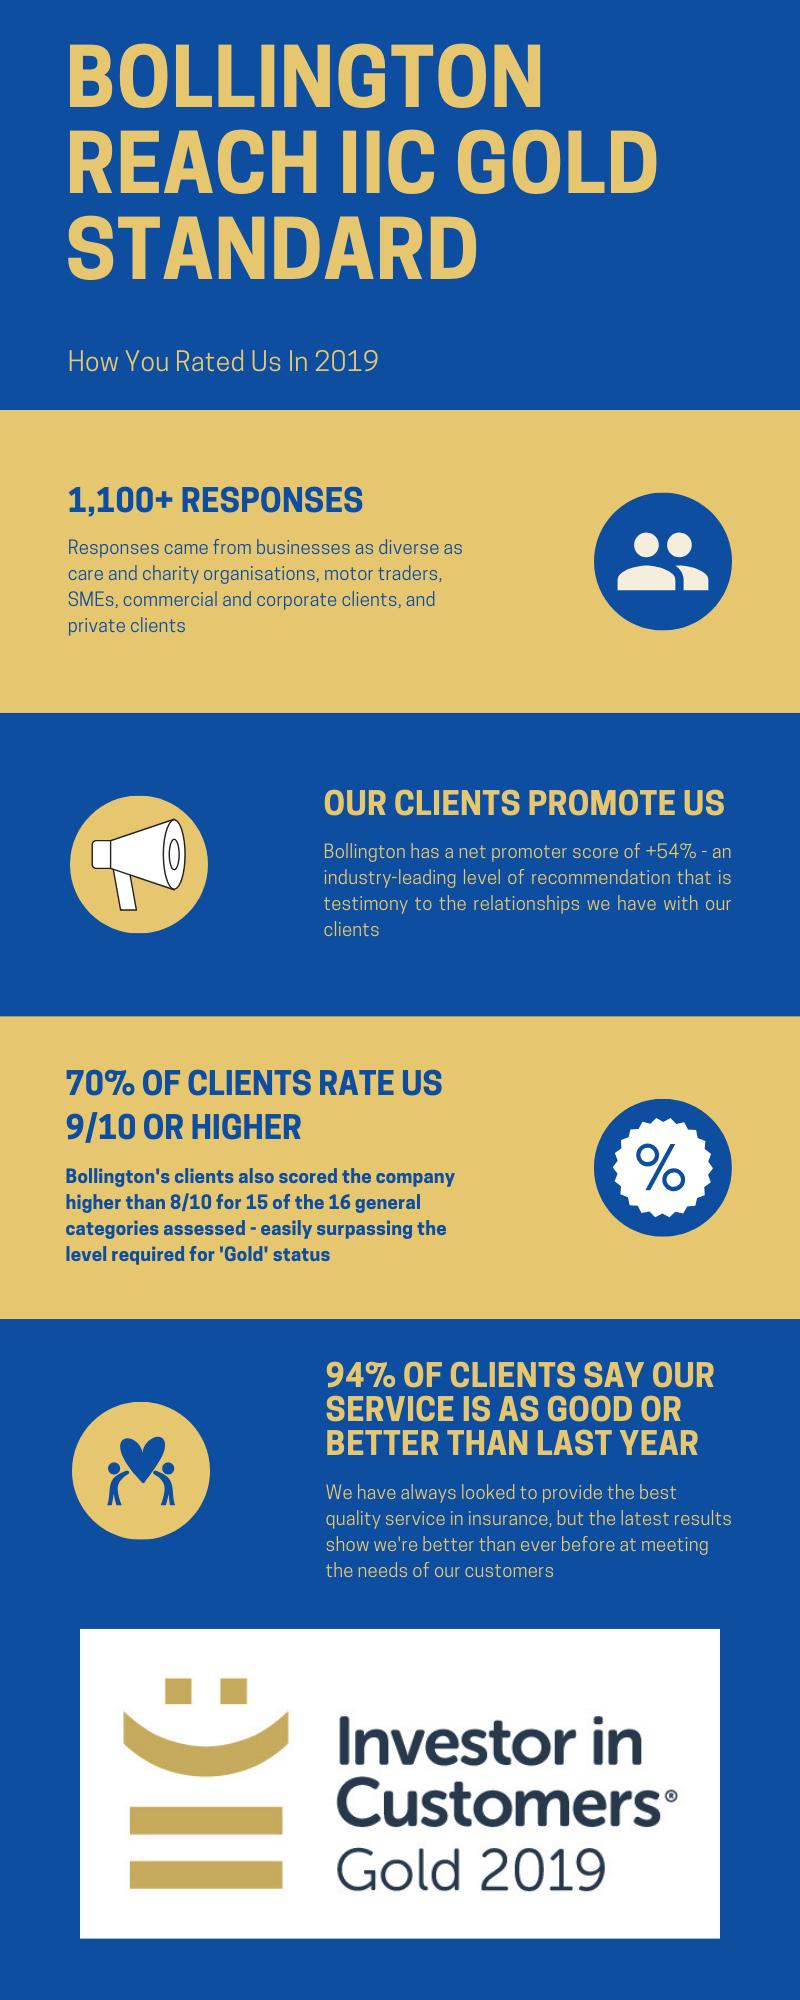 IIC Gold Standard infographic